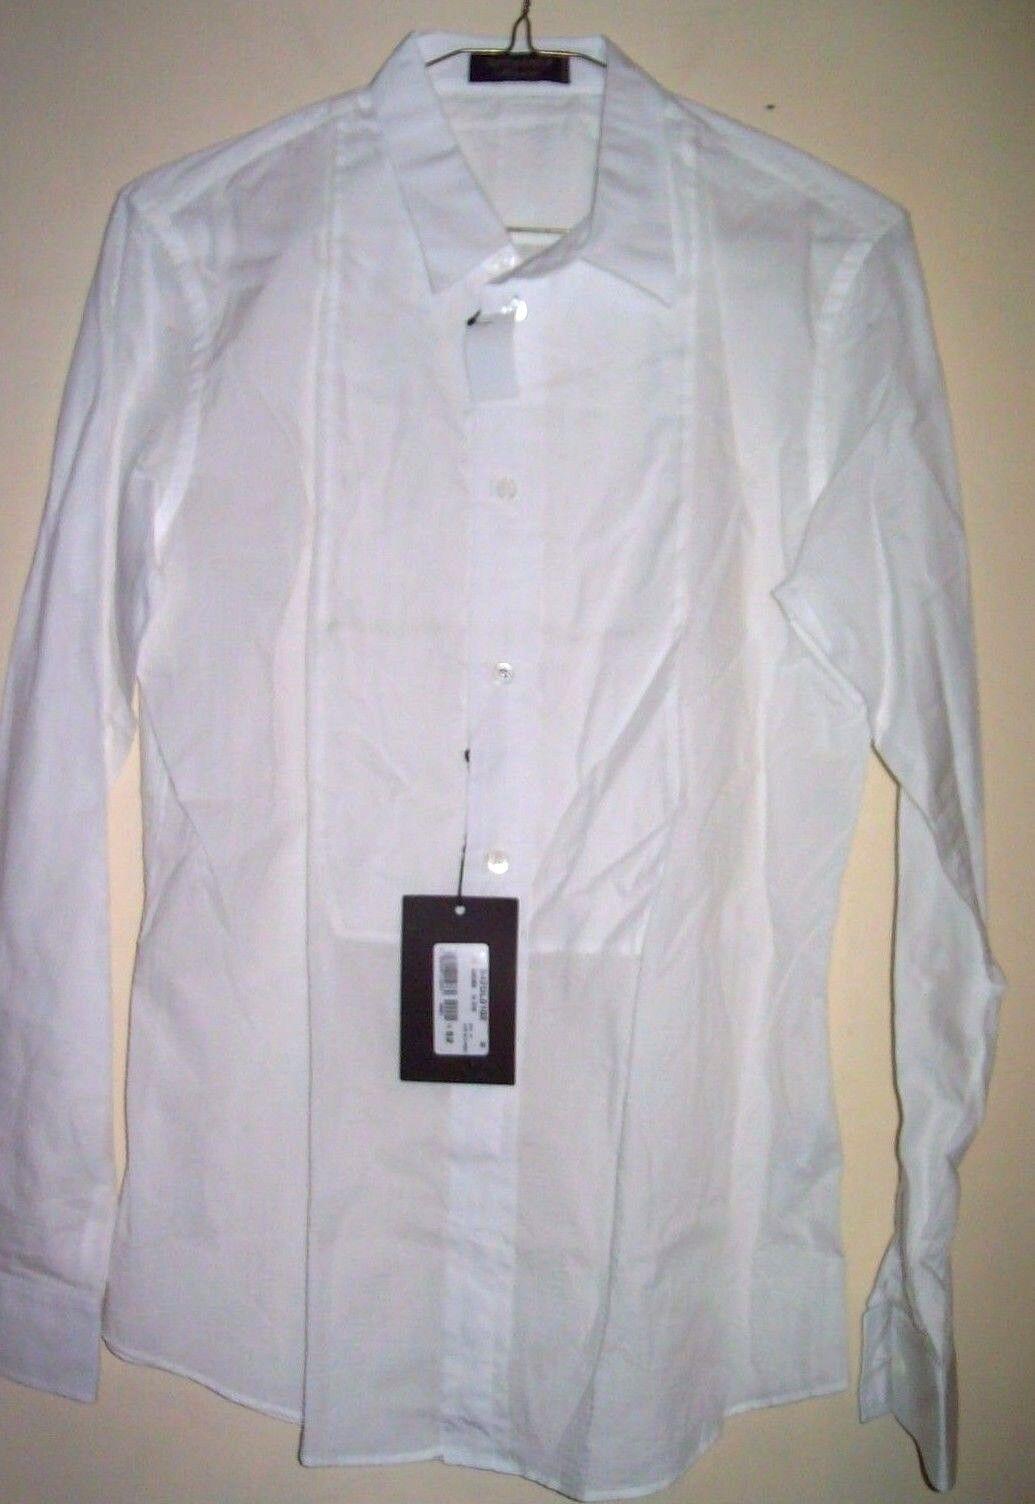 Weiß Tux hemd Größe groß Made in  Expensive VIKTOR&ROLF Dual Raised Print